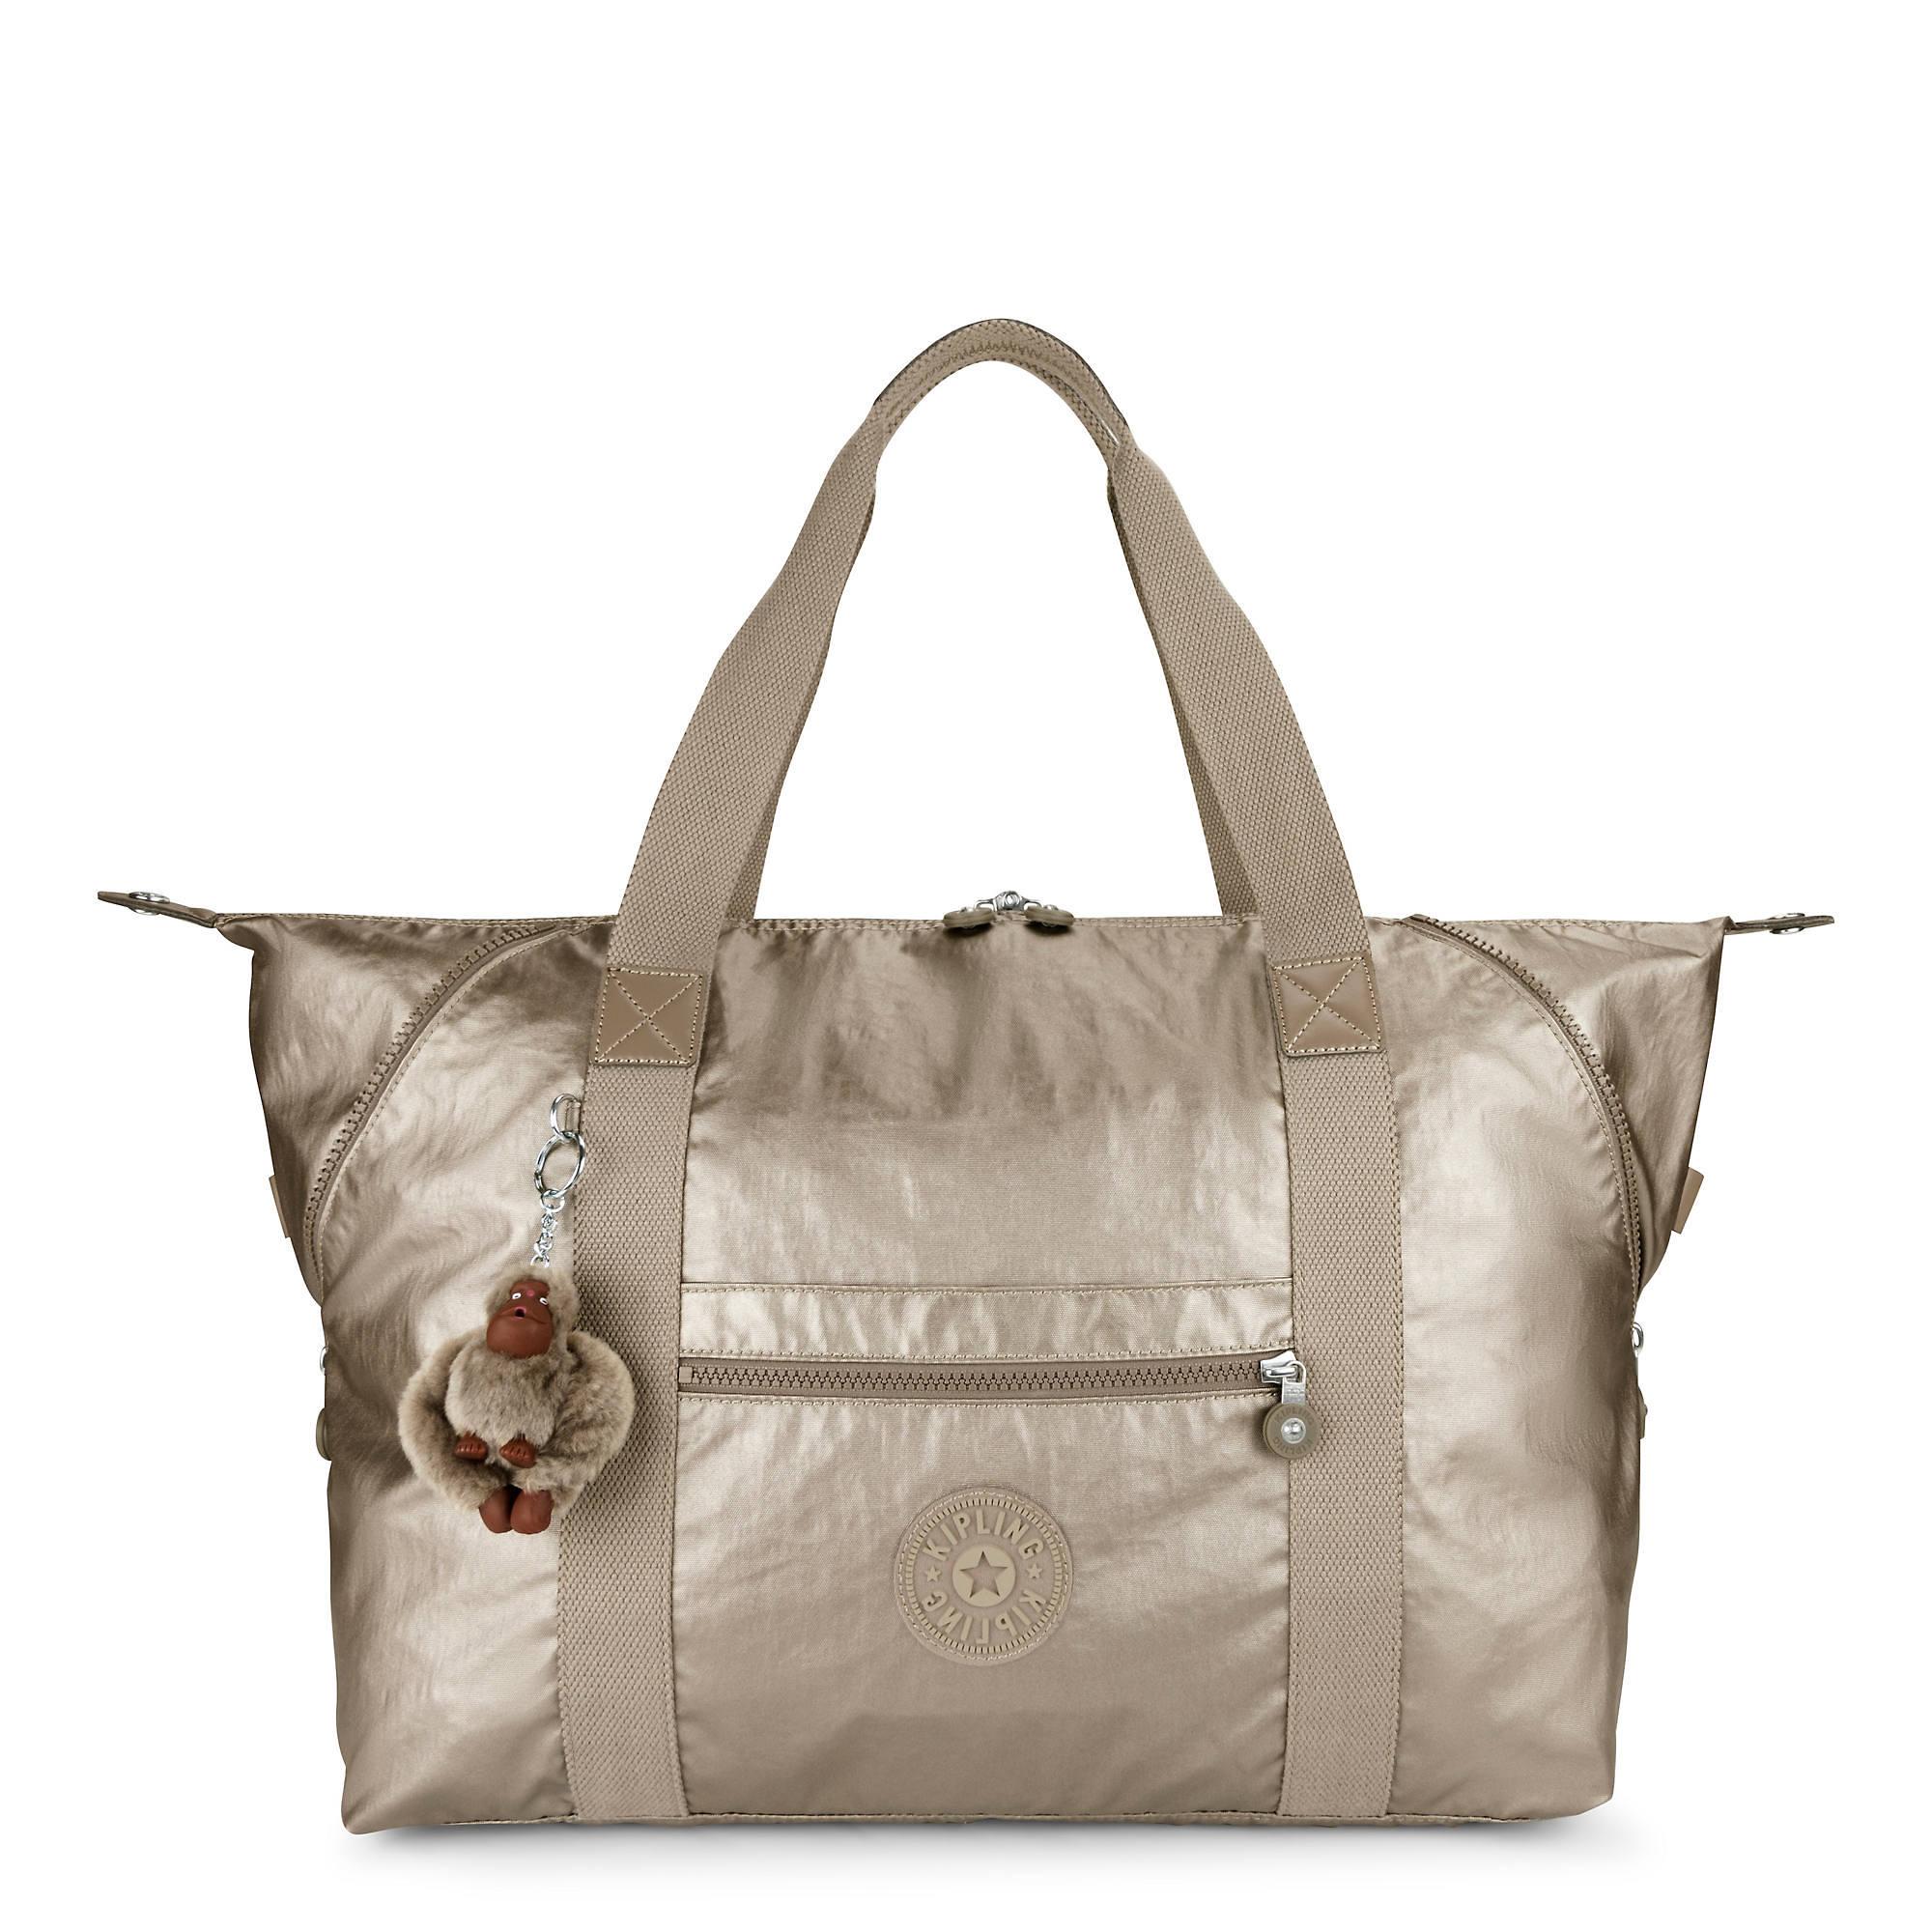 4dcb87d03261 Art Medium Metallic Tote Bag